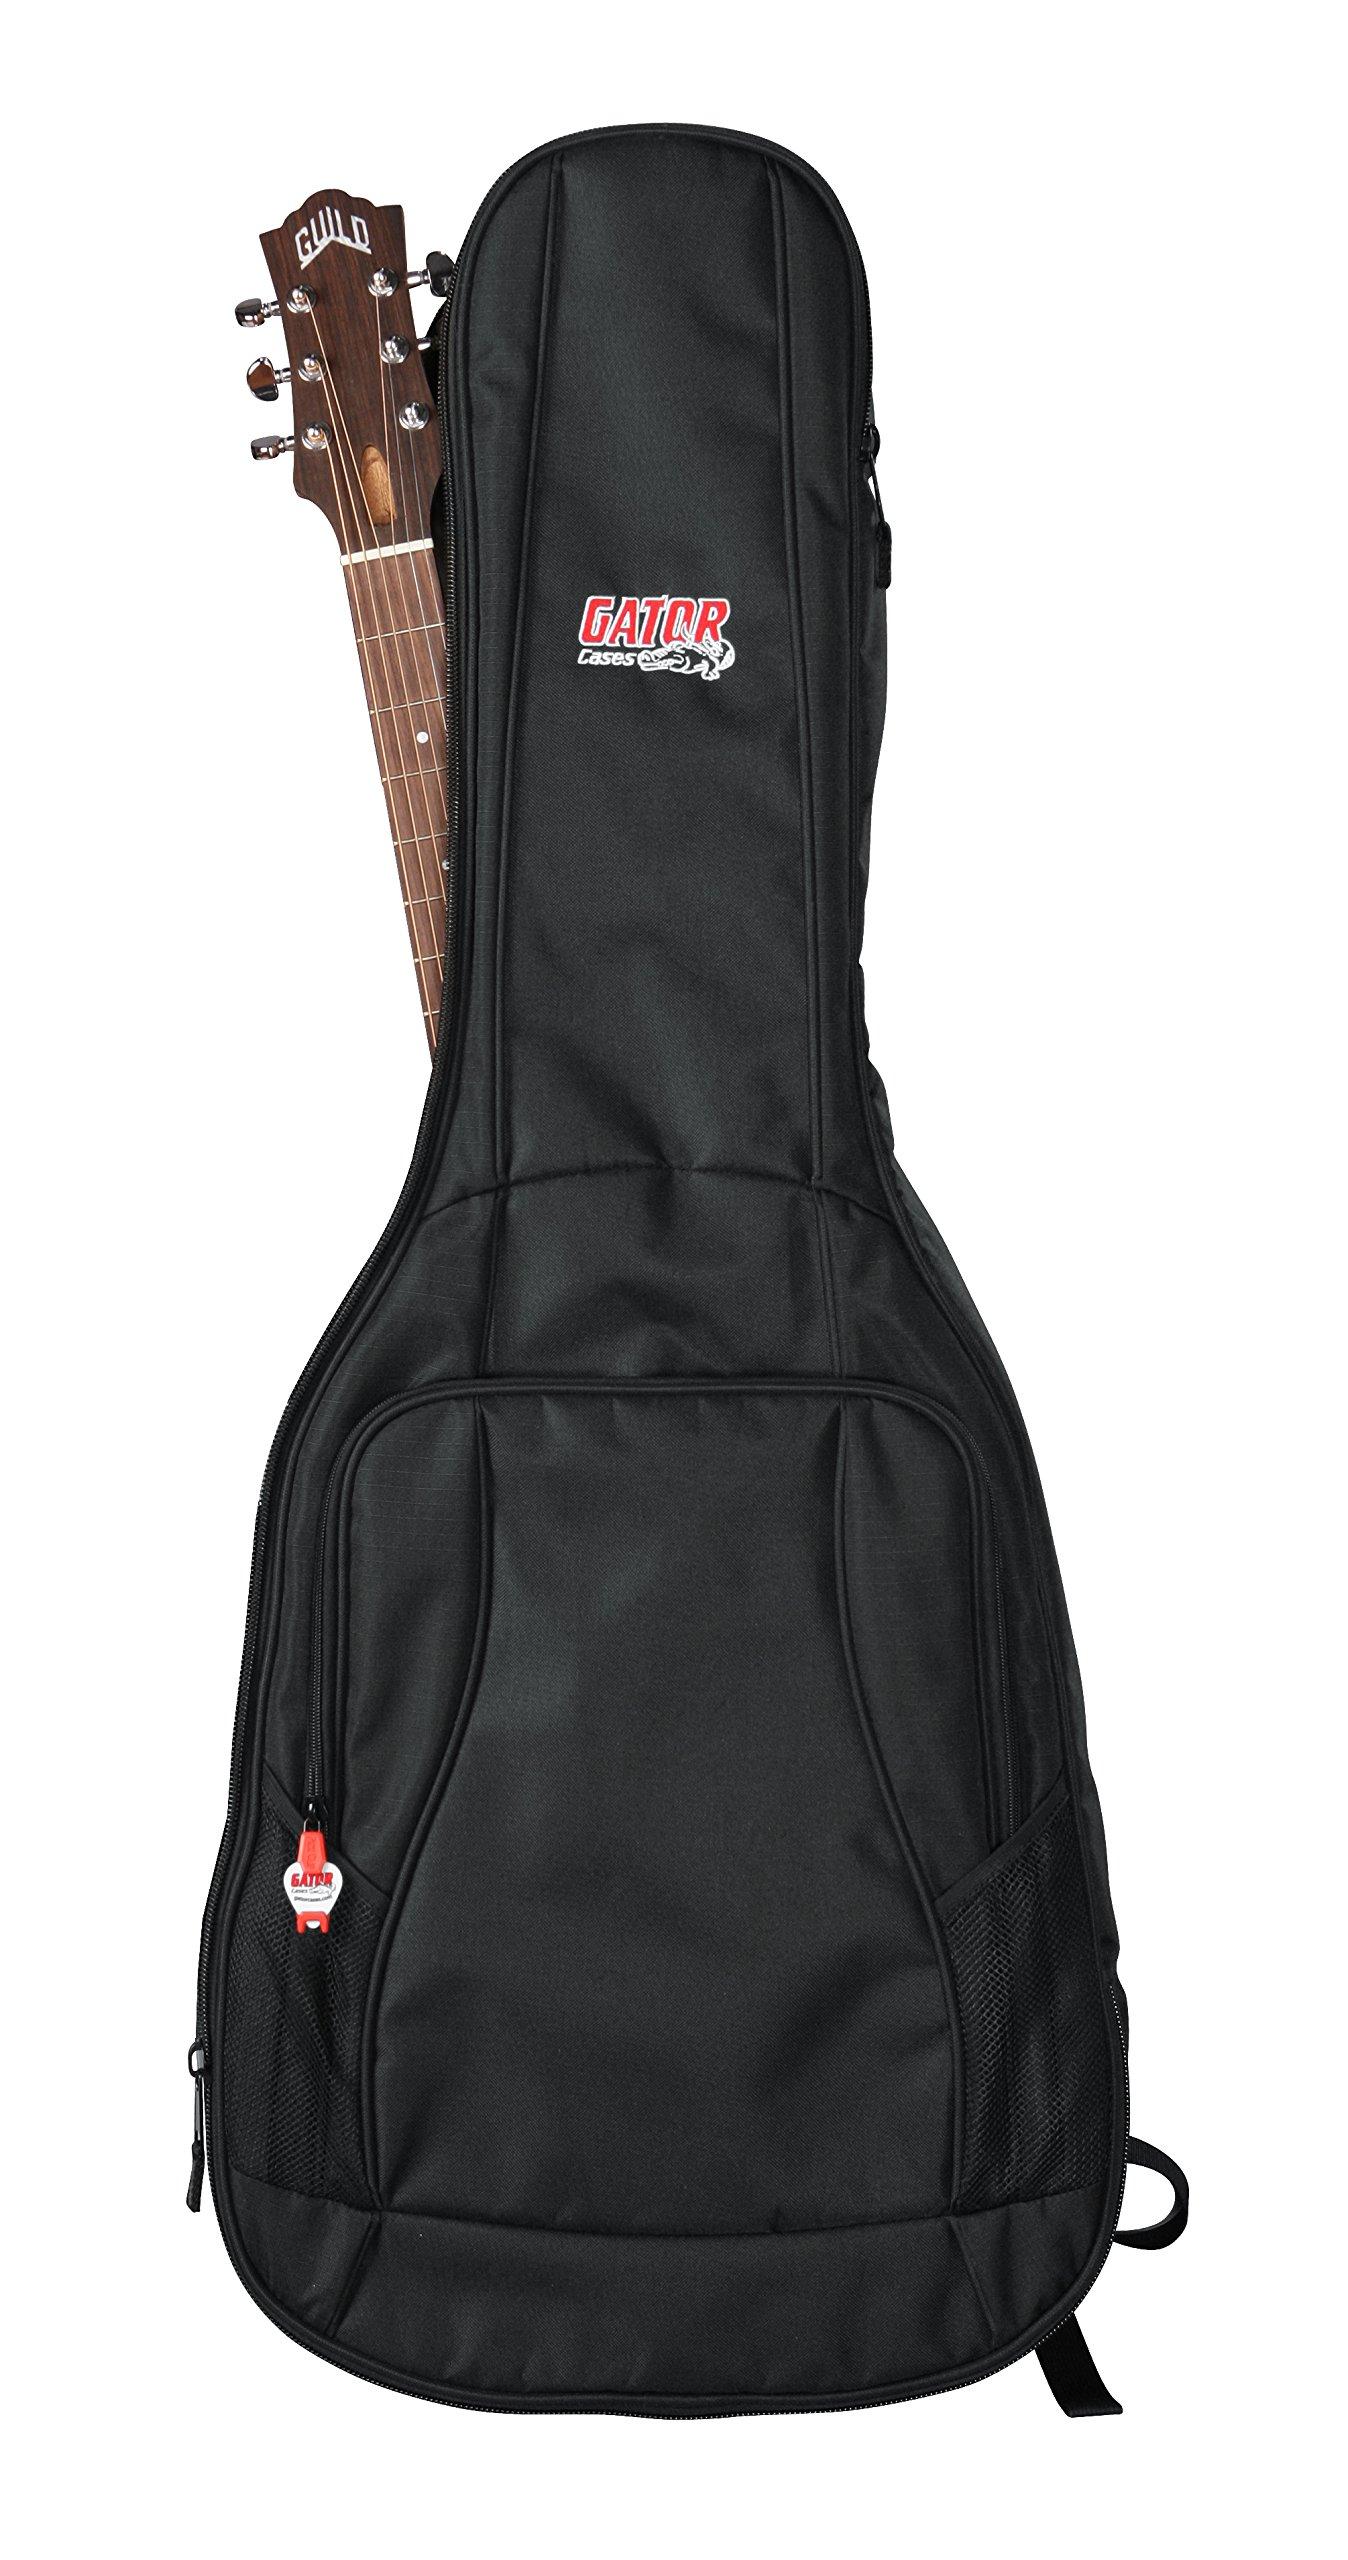 Gator GB-4G-ACOUSTIC Cases 4G Series Gig Bag For Acoustic Guitars With Adjustable Backpack Straps